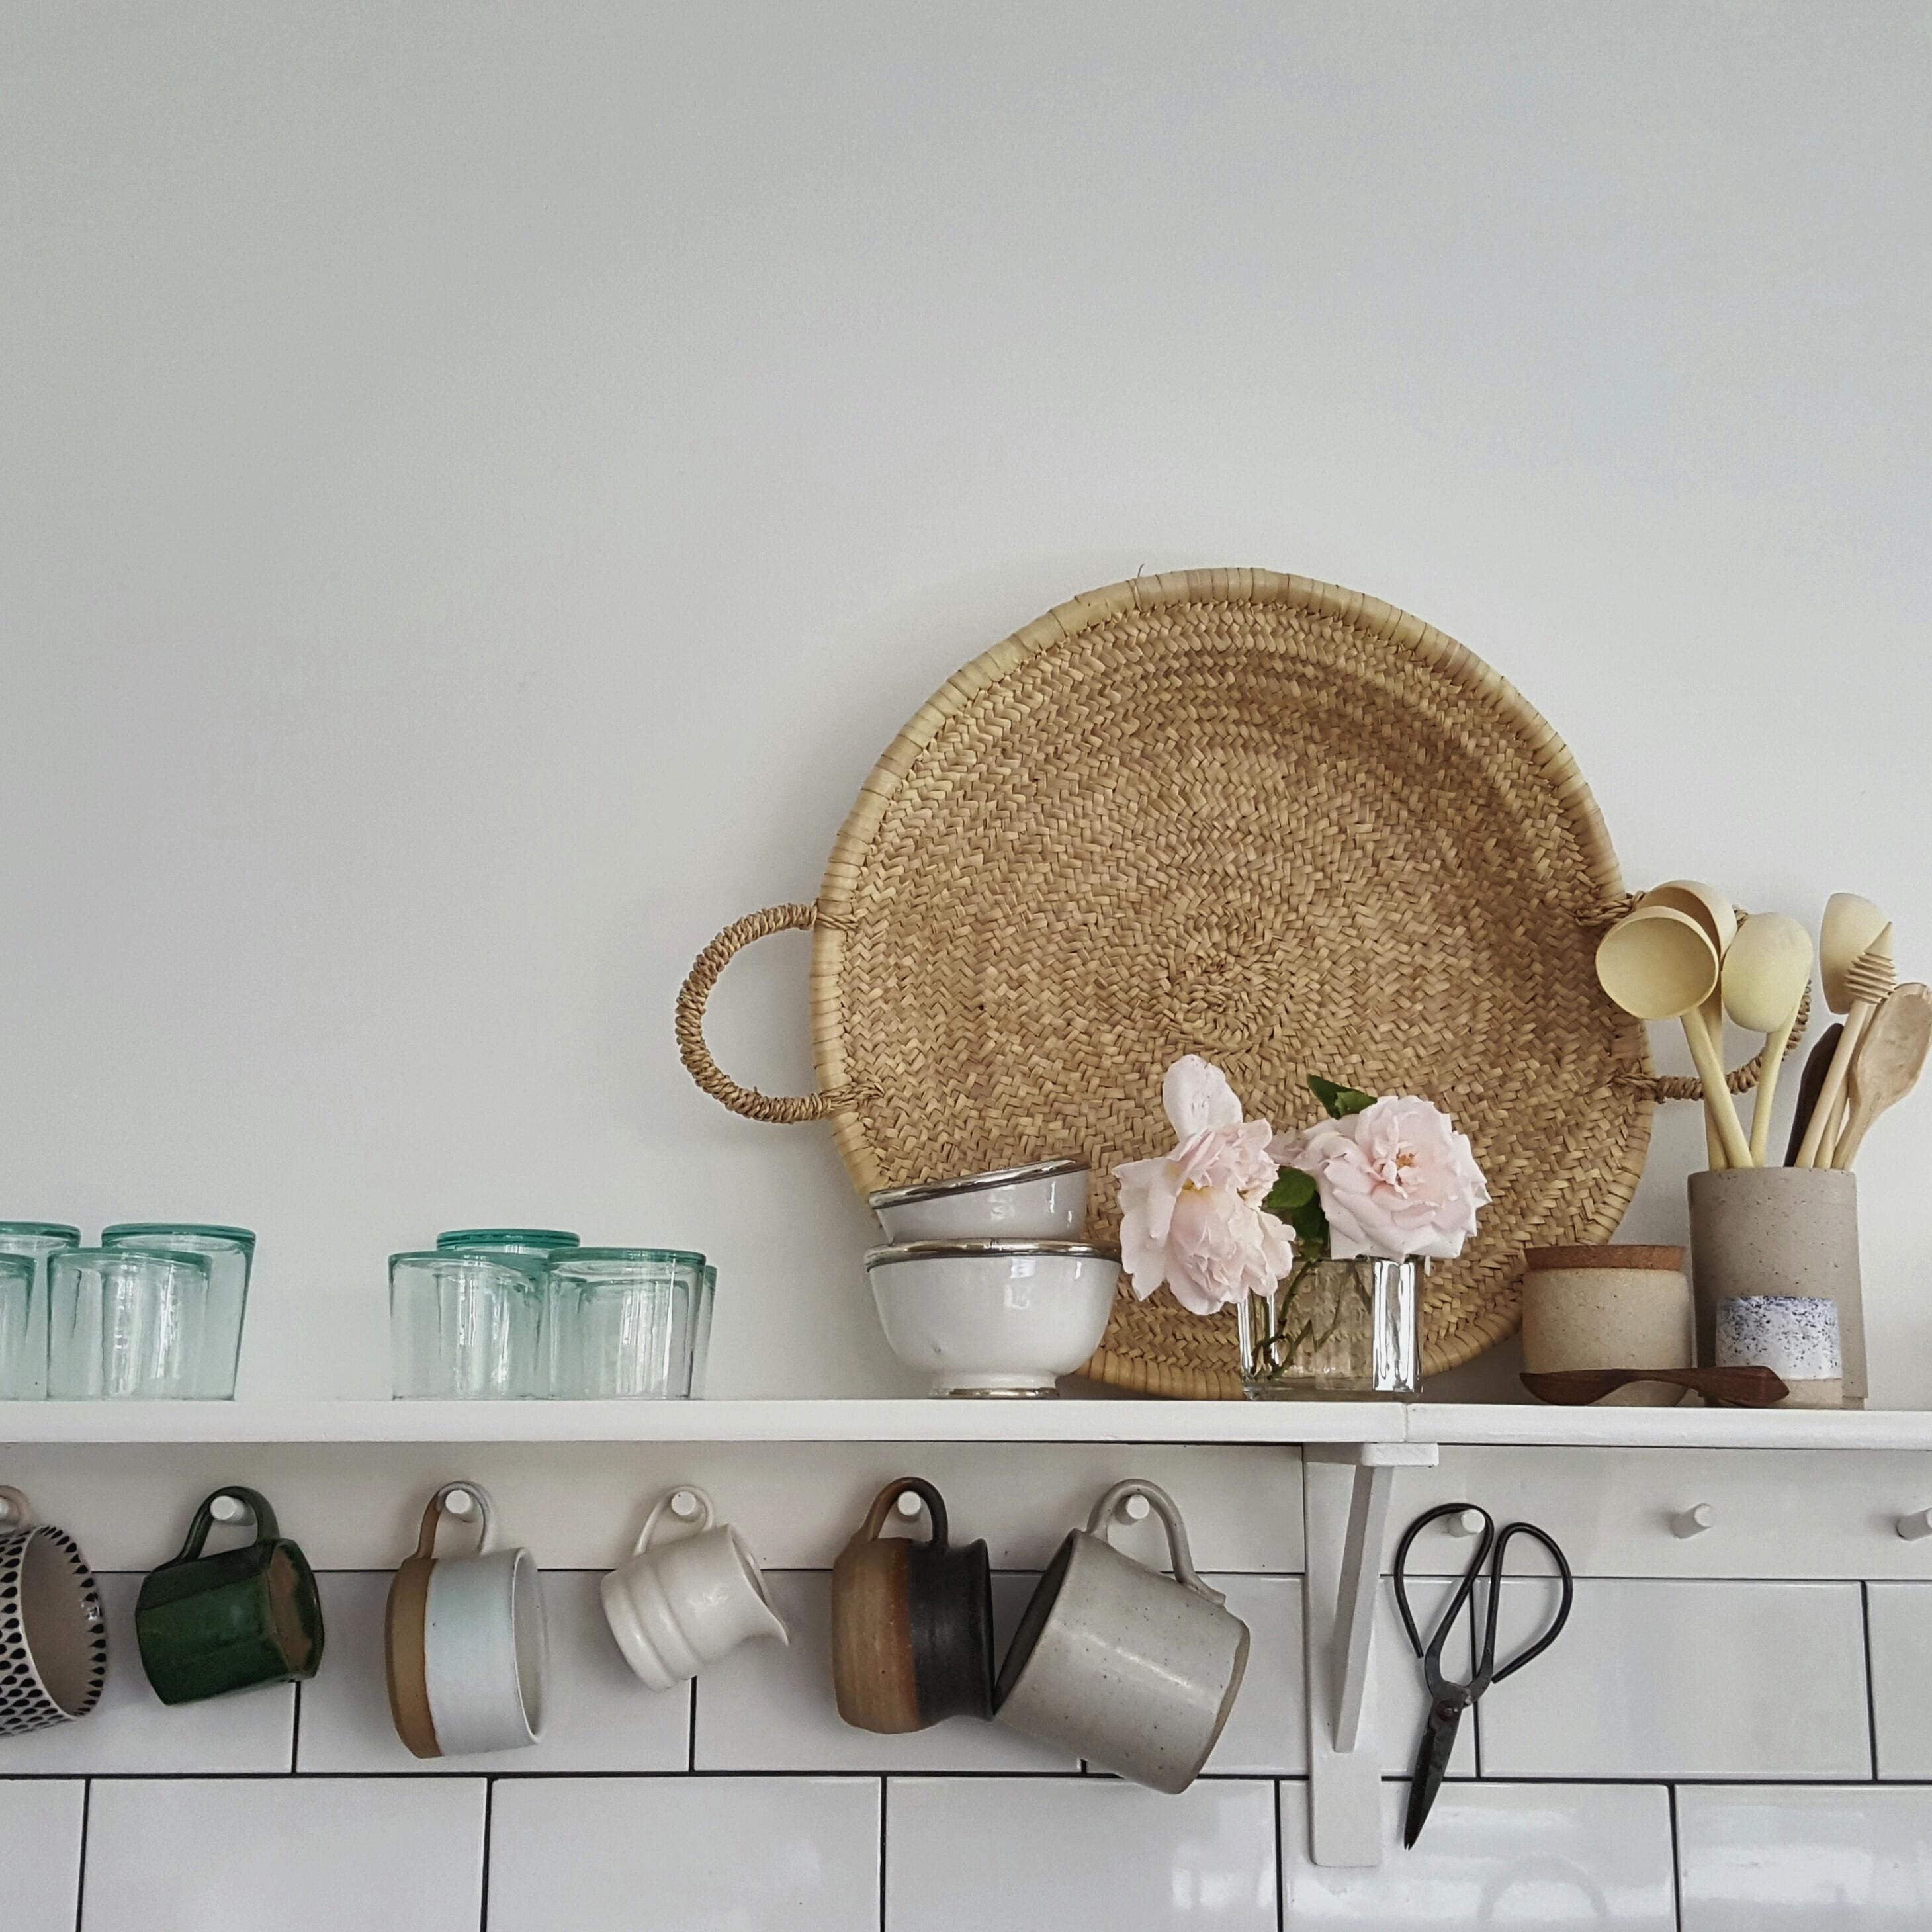 Lou Archell's kitchen